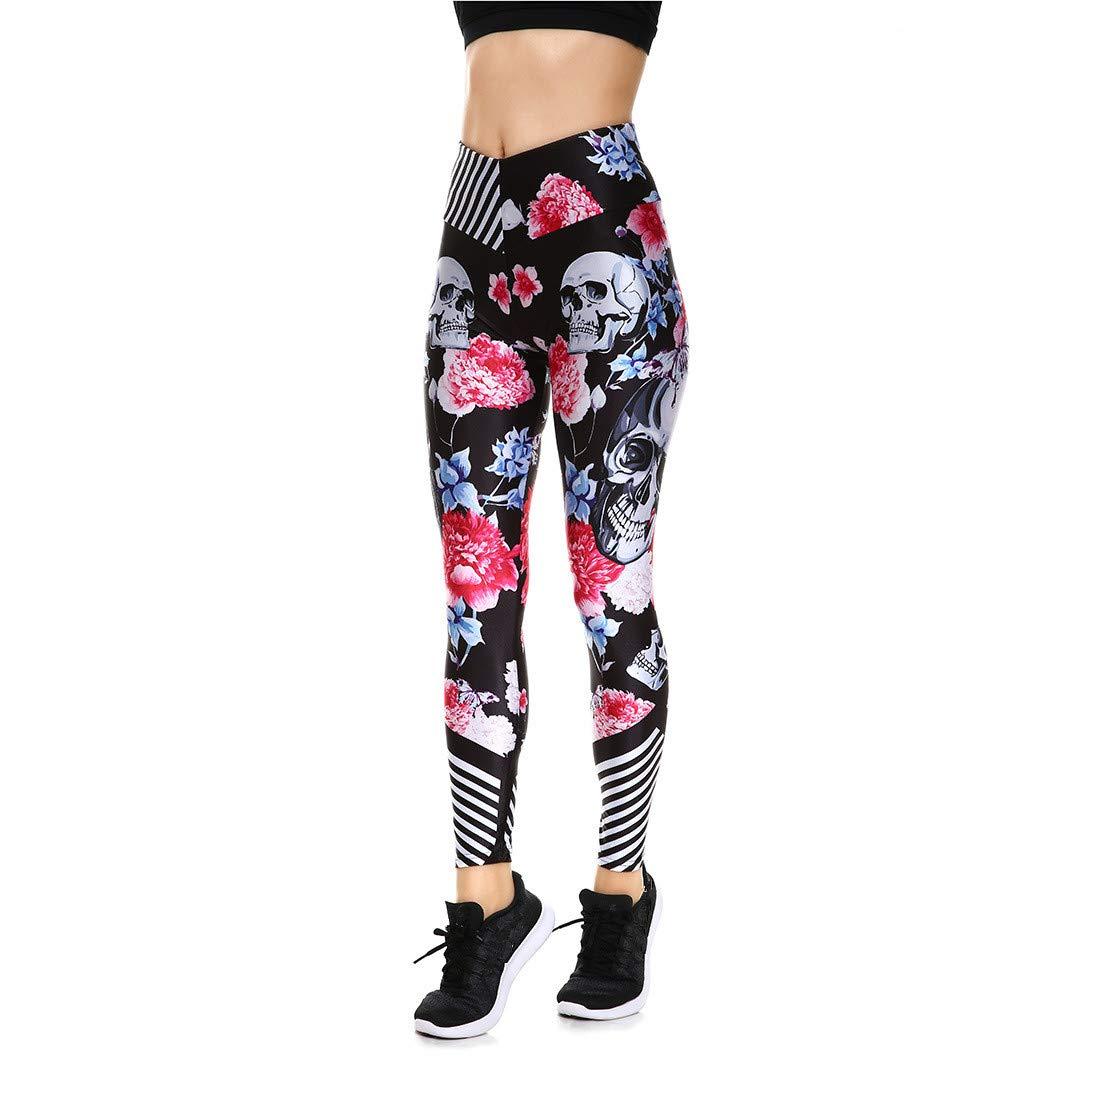 Fanii Quare Women's High Waist Dri-Fit Running Tights Printed Training Compression Workout Pants Flower Skull S